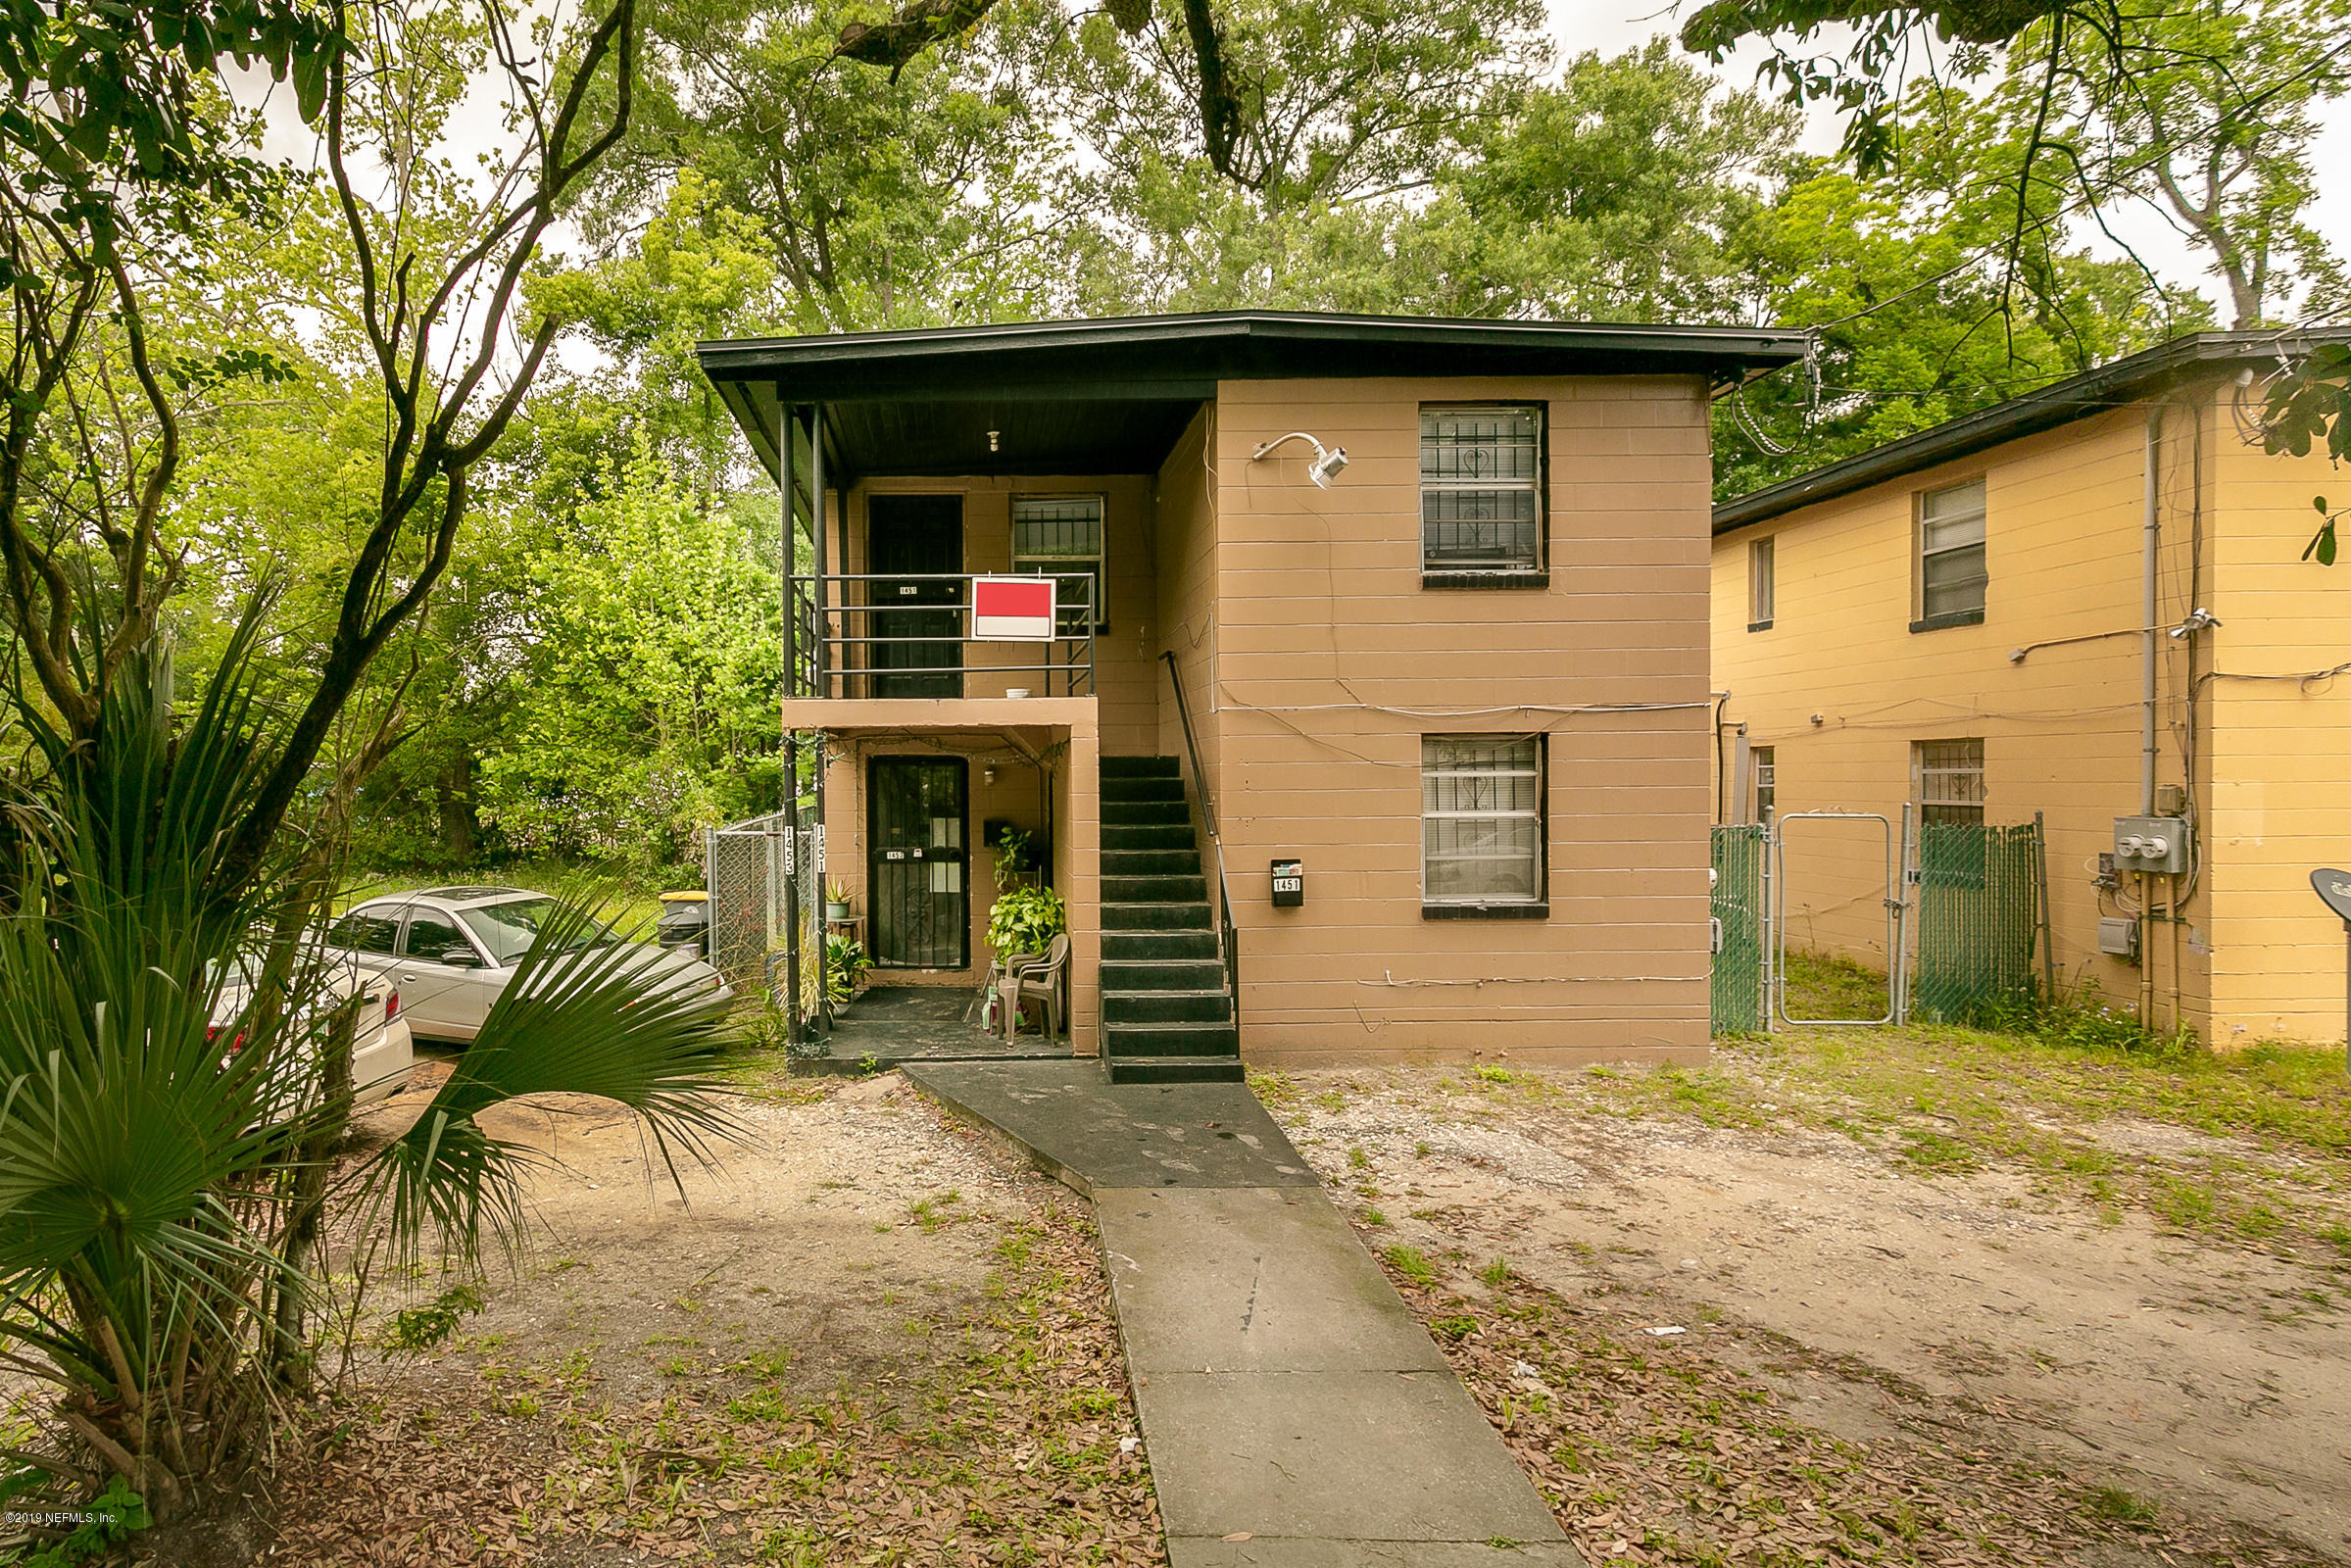 1451 21ST, JACKSONVILLE, FLORIDA 32209, 4 Bedrooms Bedrooms, ,2 BathroomsBathrooms,Commercial,For sale,21ST,991340